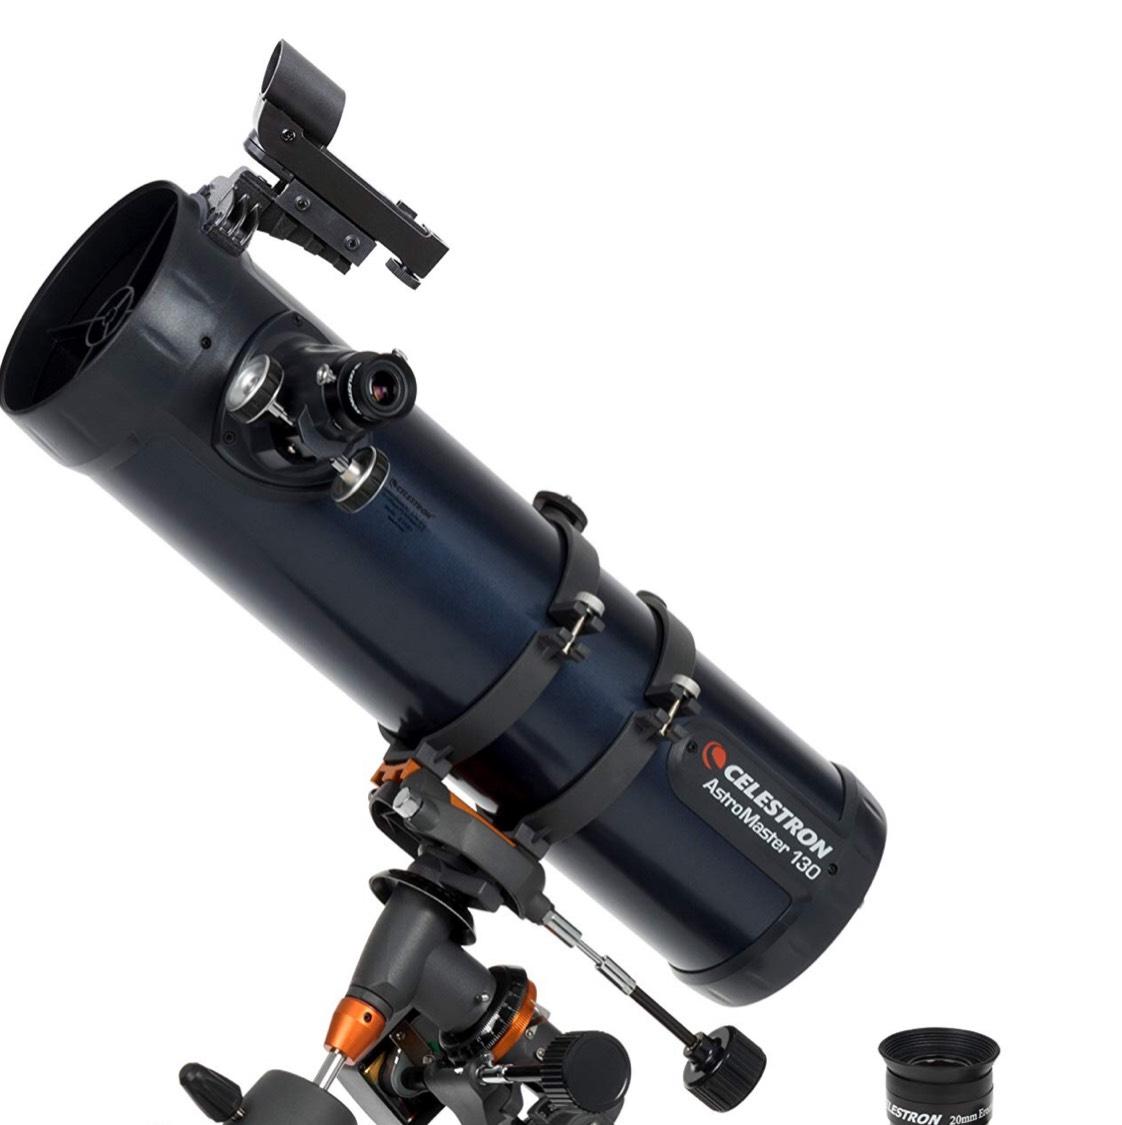 Celestron 31051 AstroMaster 130EQ Reflector Telescope Motor Drive - £165.99 @ Amazon